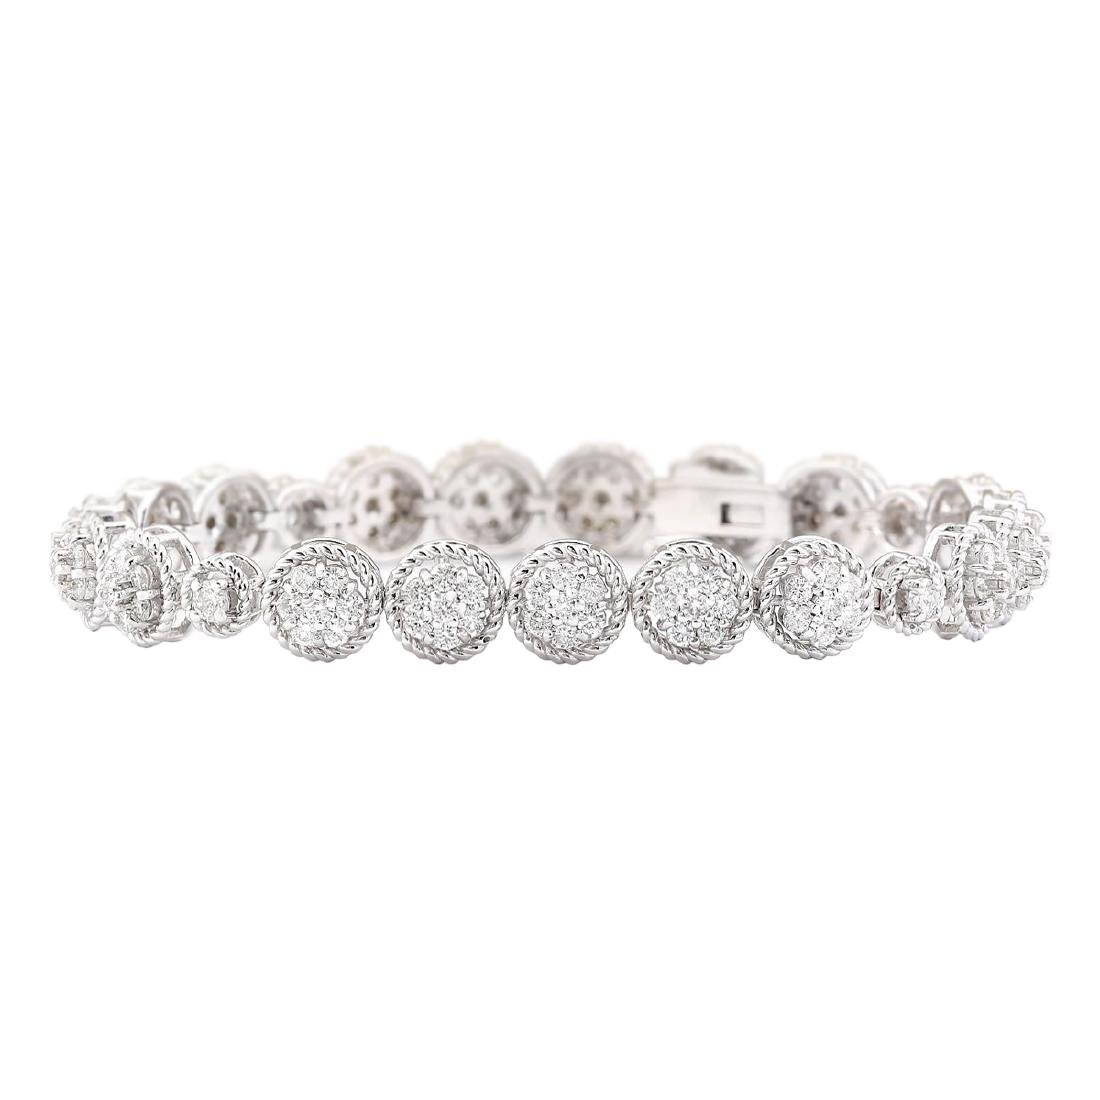 3.75 CTW Natural Diamond Bracelet In 18K White Gold